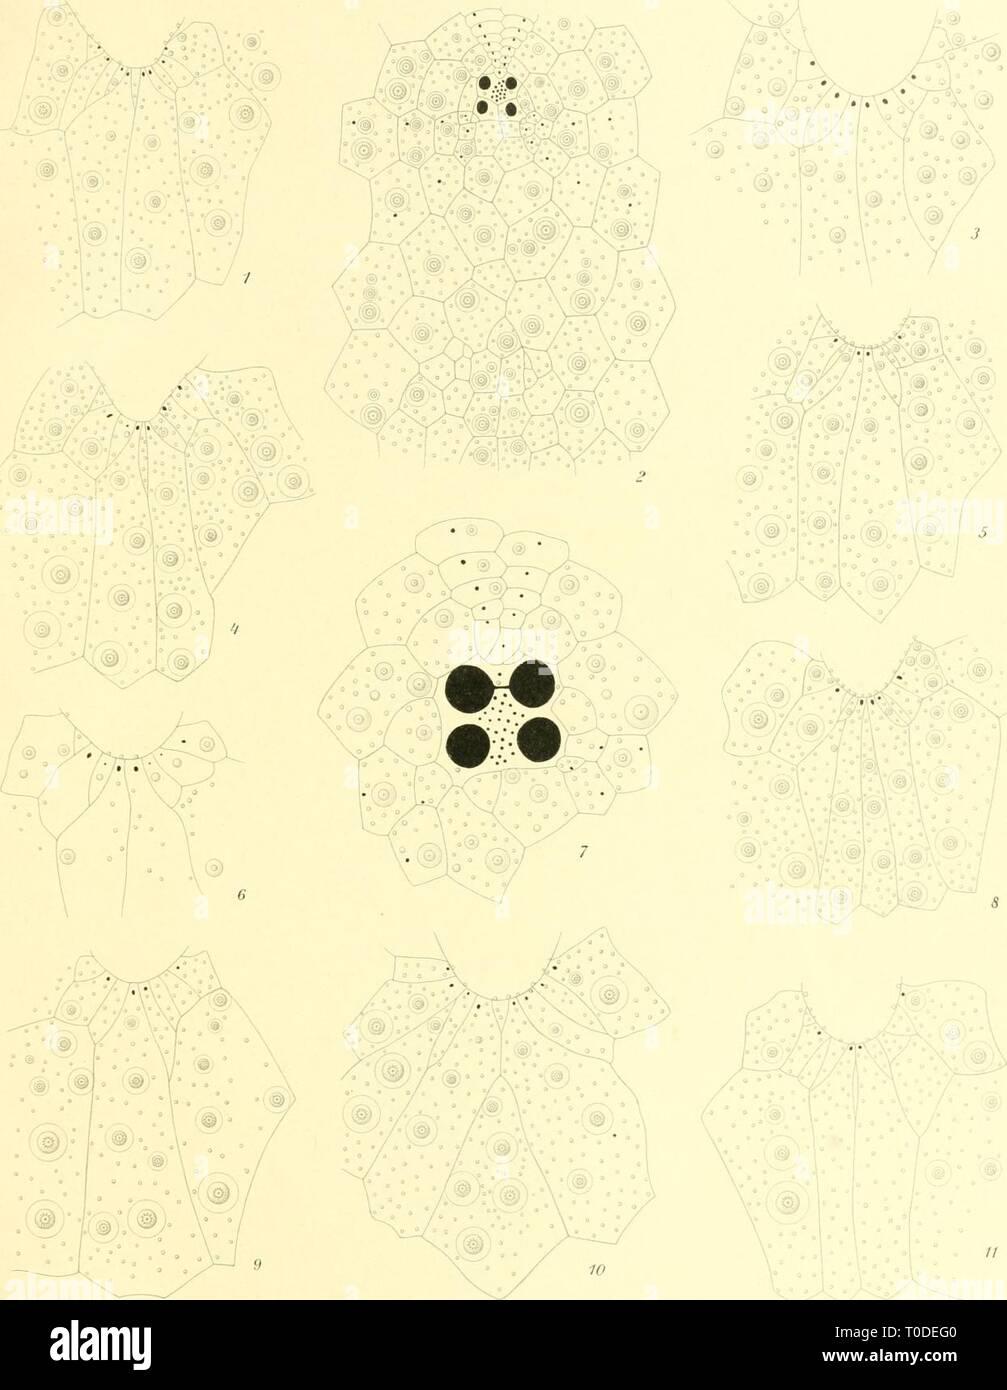 Echinoidea (1903) Echinoidea echinoidea00mort Year: 1903  fil fjolf I'.'xpt'ilitioitcit II'', Til.Mortensen, Echuioidea 11. Tab. )'///    TTUkfoT-teKstn del. 13. 7. ronr-liilc^ia M'/ini/di Mrlsii., 'l (!. iS 11. Poni-la Ic.-iid .leffrt'i/.'ii U'.J'/i. Stock Photo